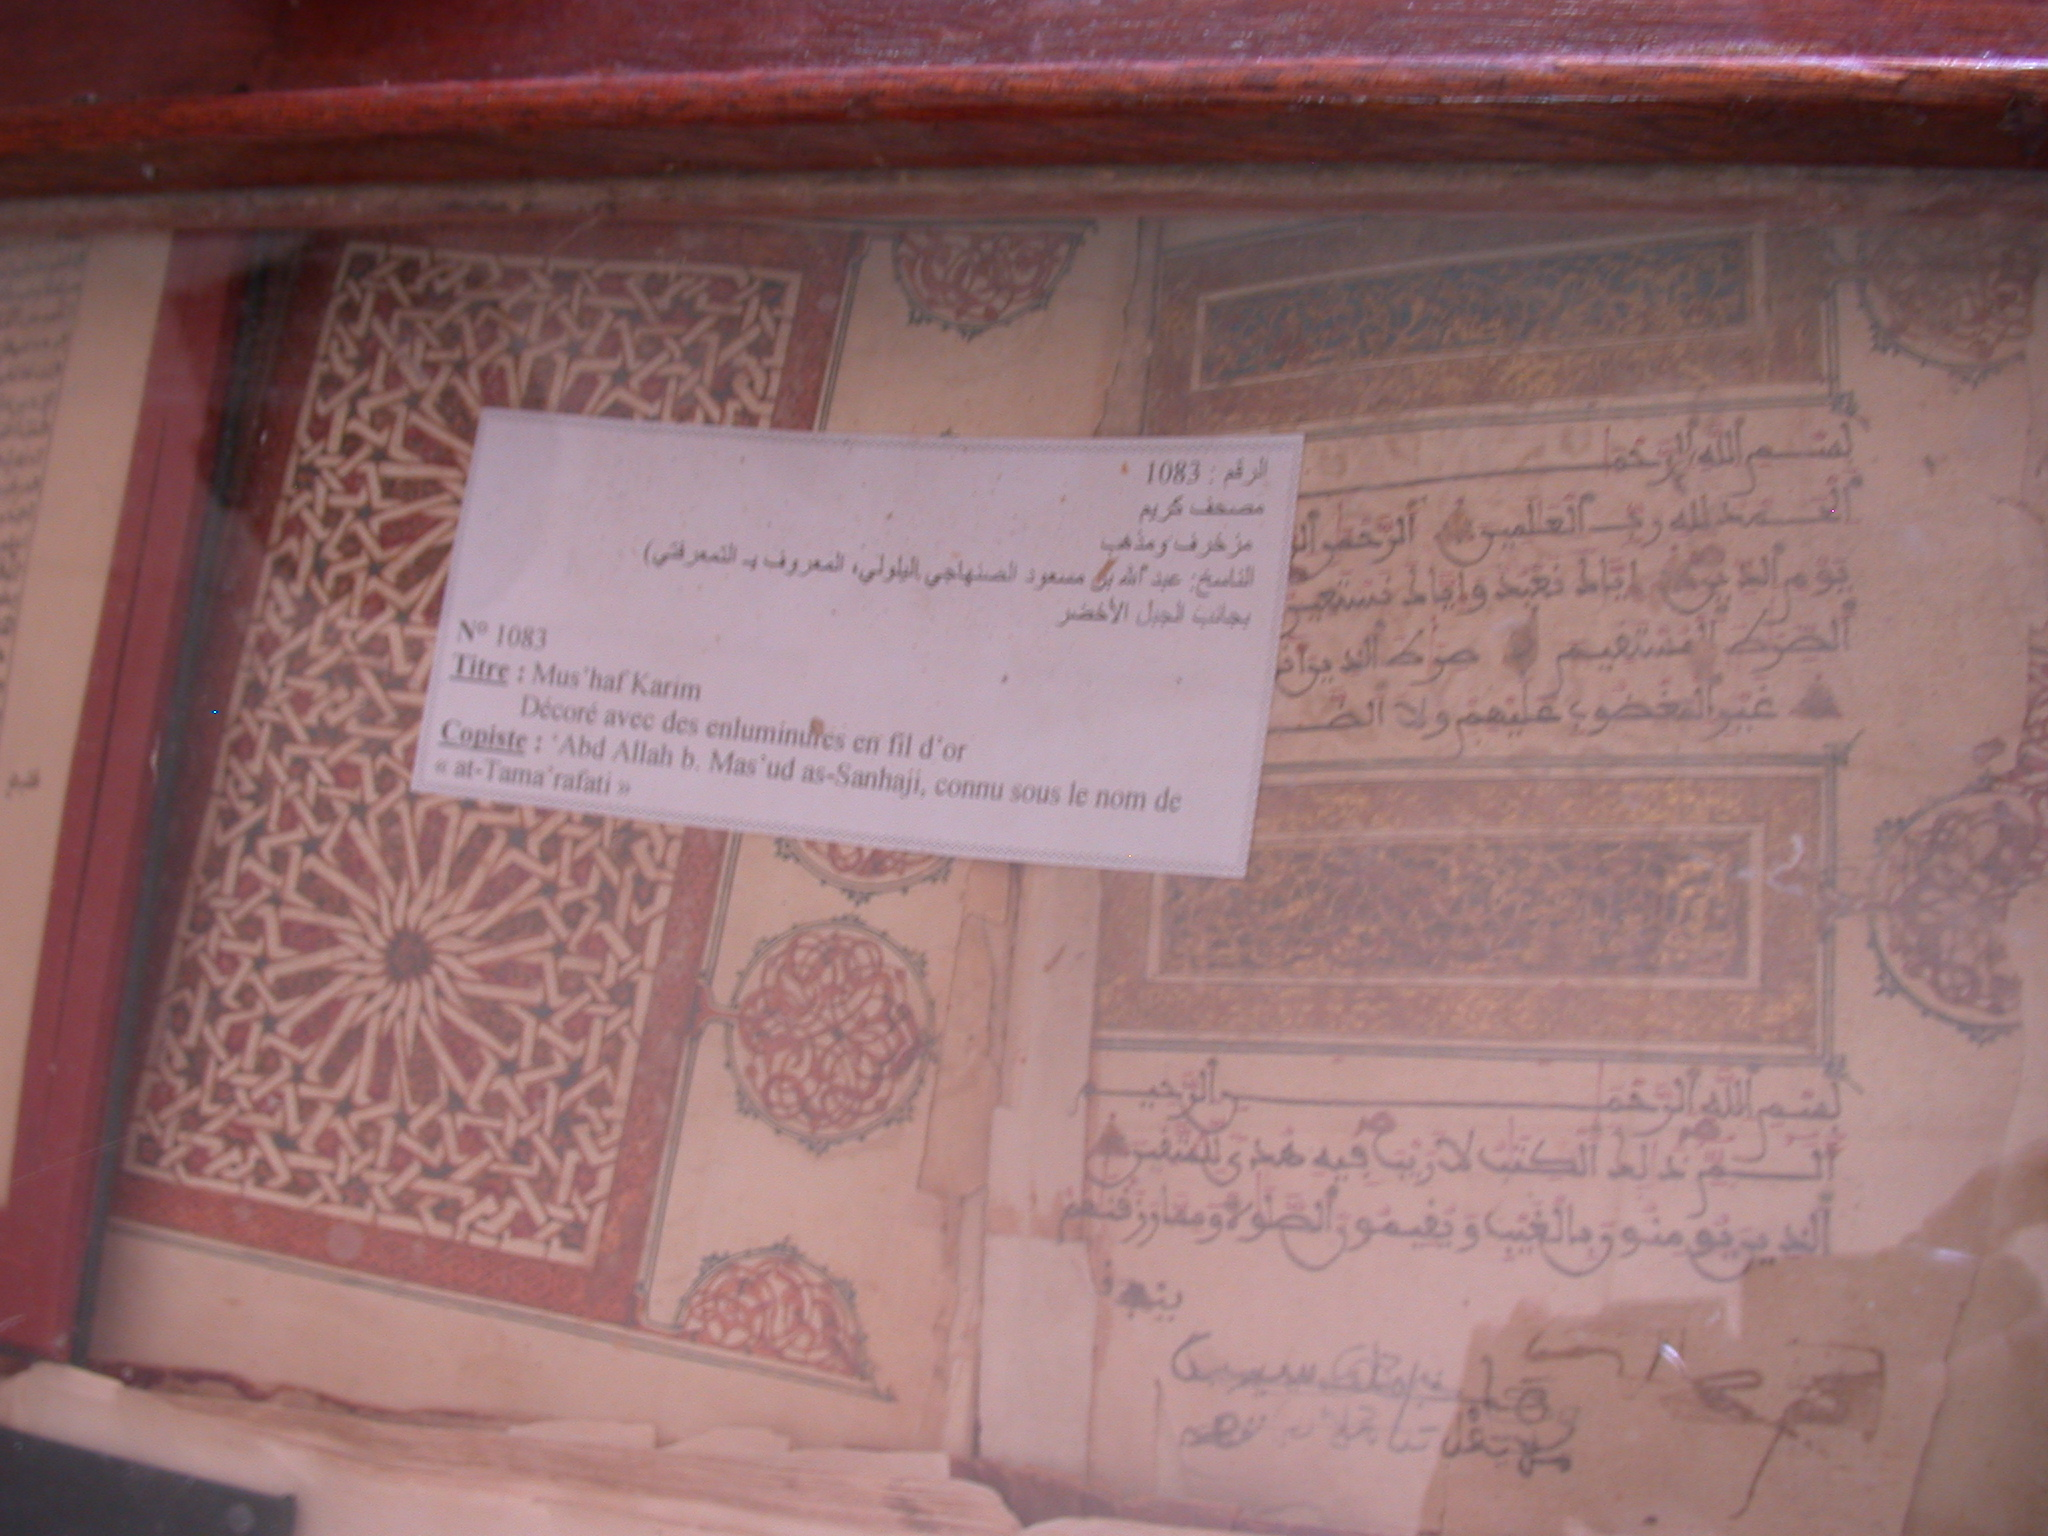 Photo of Manuscript, Mus haf Karim, Illuminated in Gold Leaf, Ahmed Baba Institute, Institut des Hautes Etudes et de Recherches Islamiques, Timbuktu, Mali